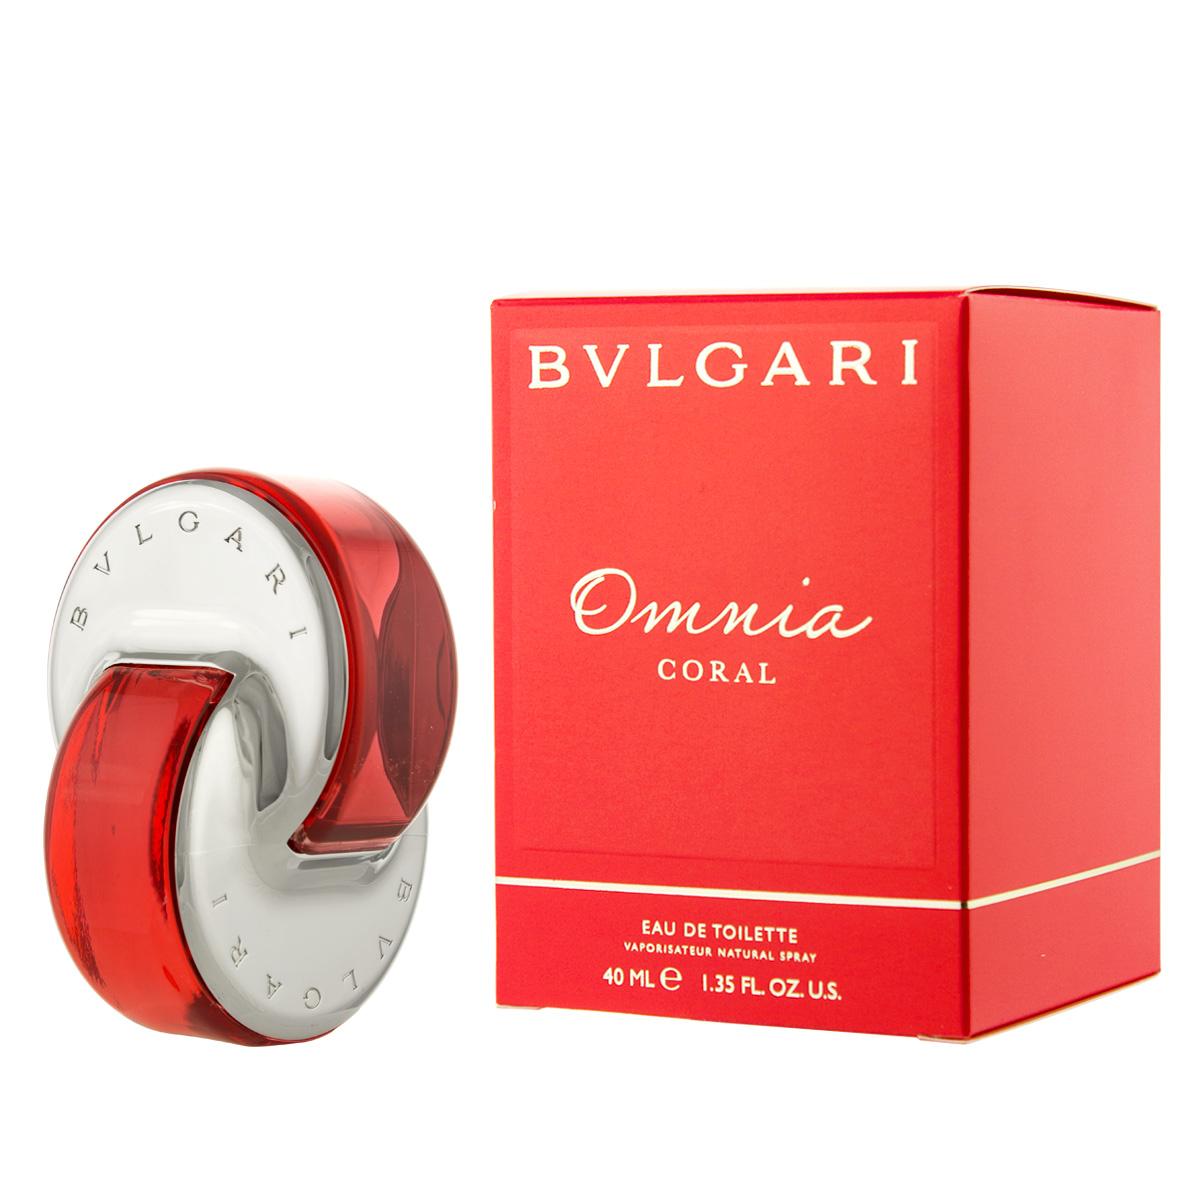 Bvlgari Omnia Coral EDT 40 ml W